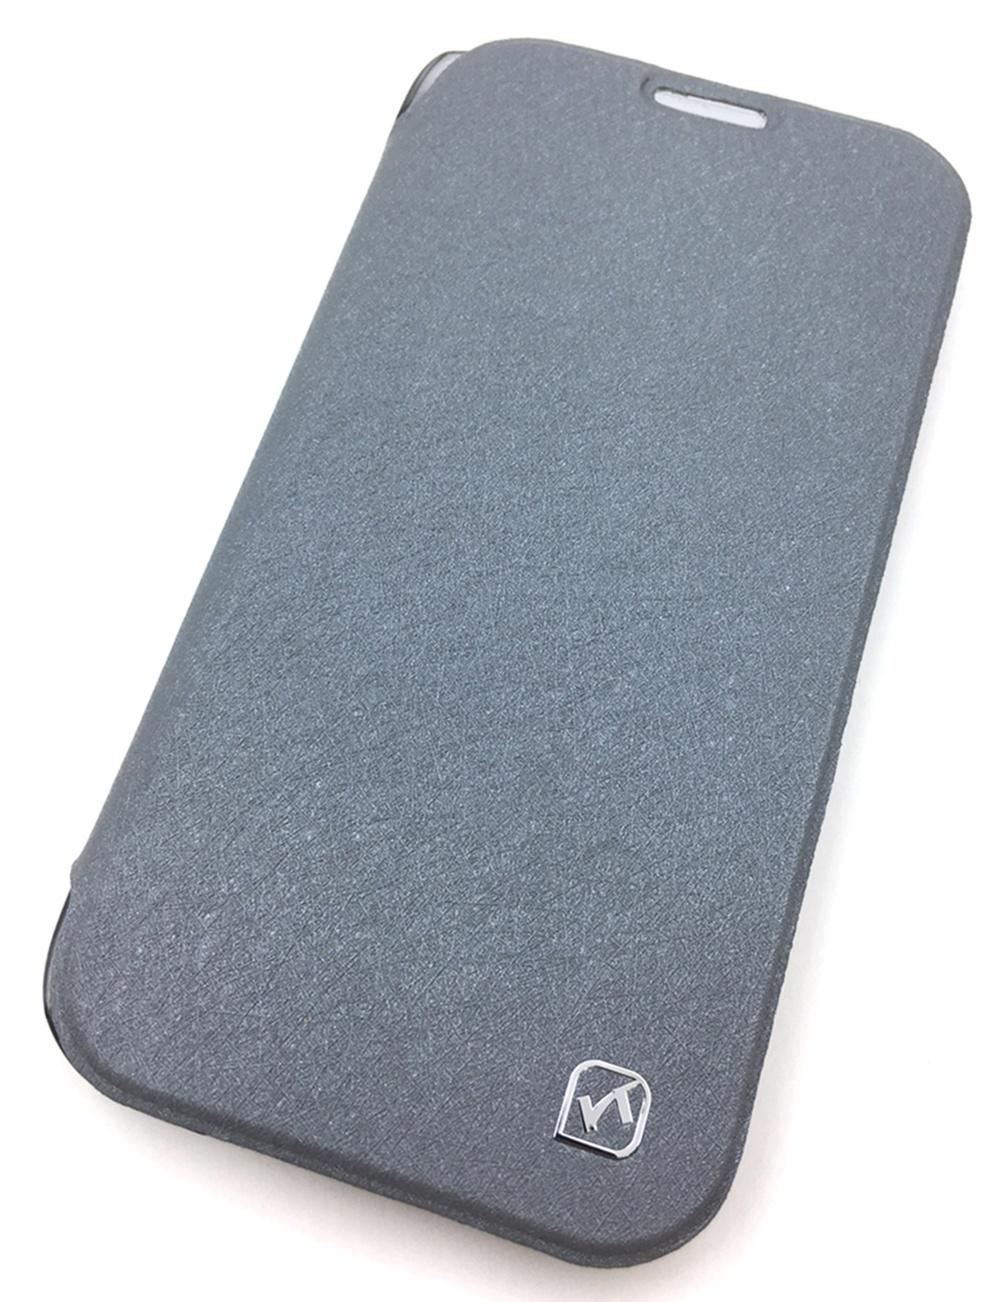 Чехол для сотового телефона Мобильная мода Samsung S4 Чехол-книжка HOCO Ice Series, пластик, серый